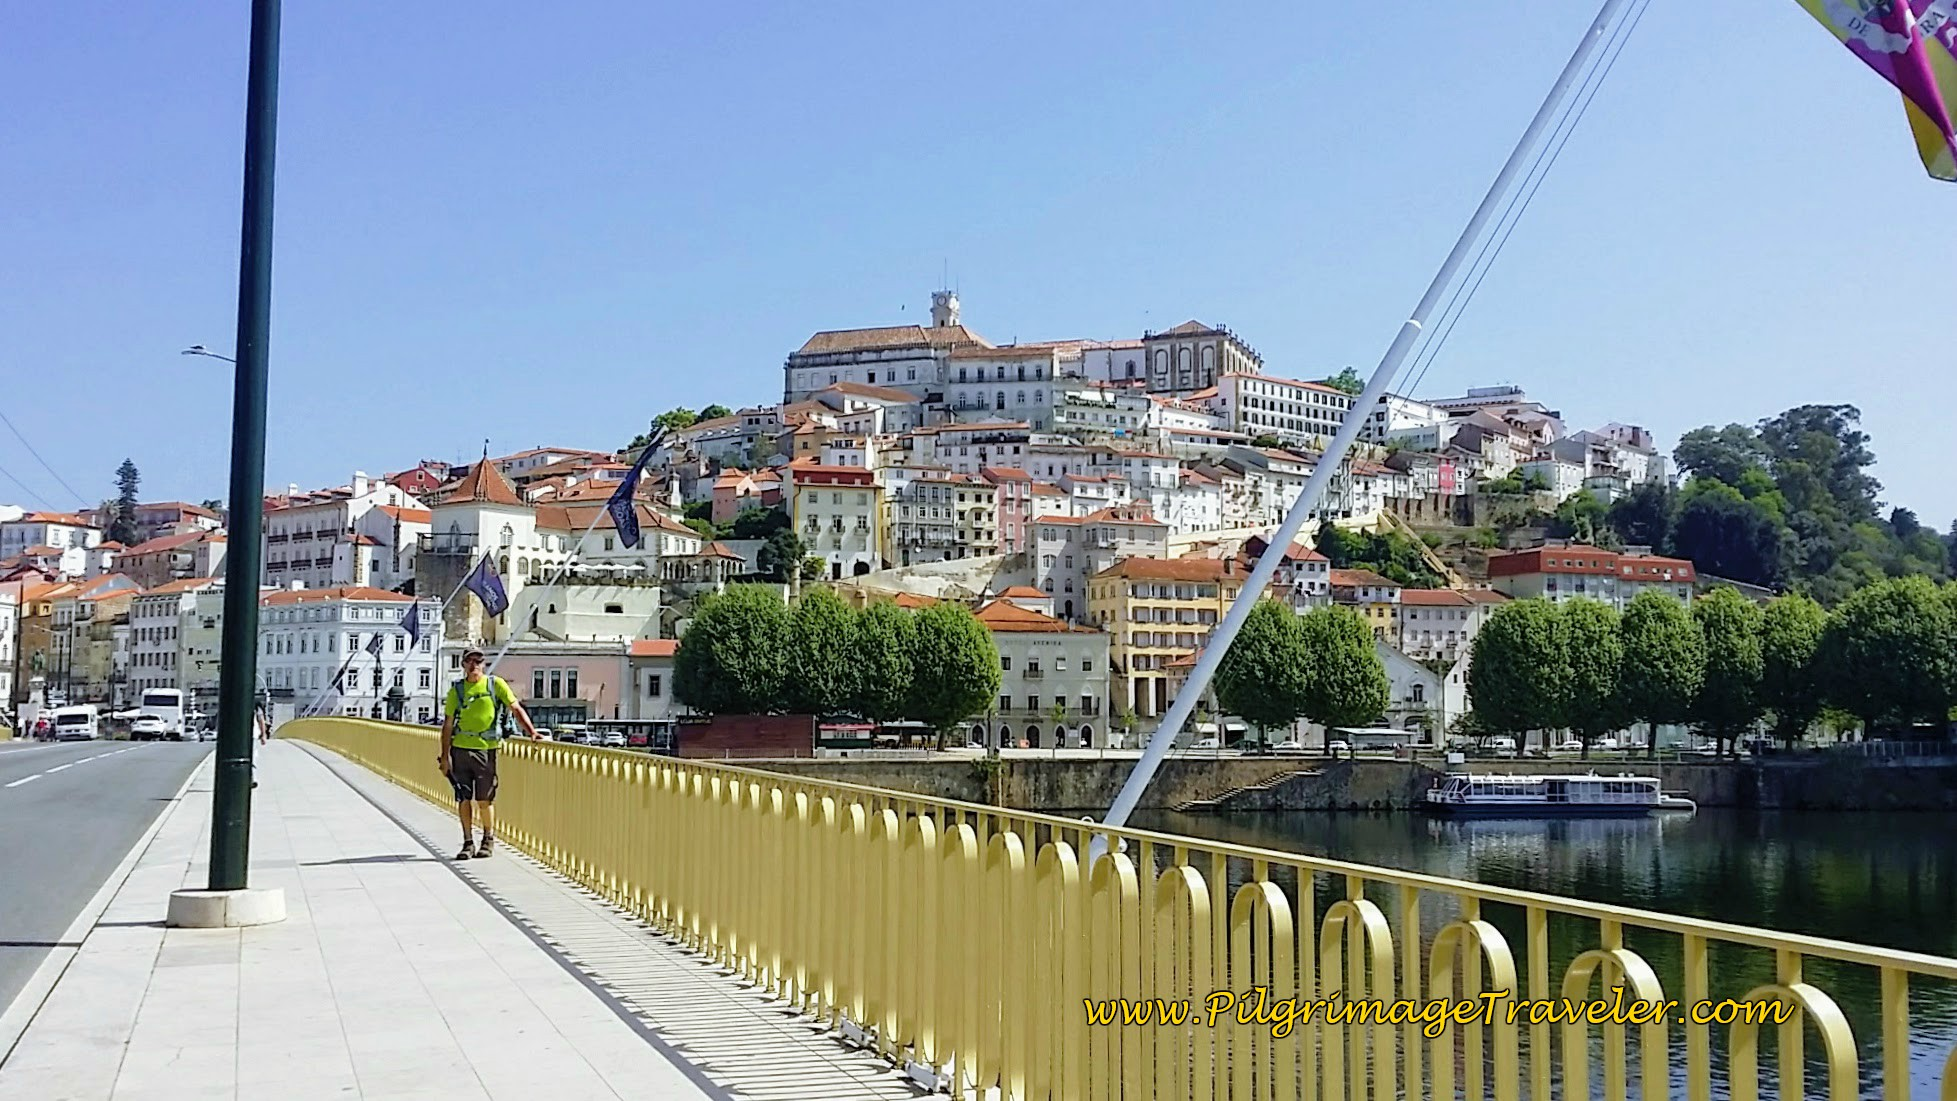 Ponte de Santa Clara Bridge in Coimbra, Portugal